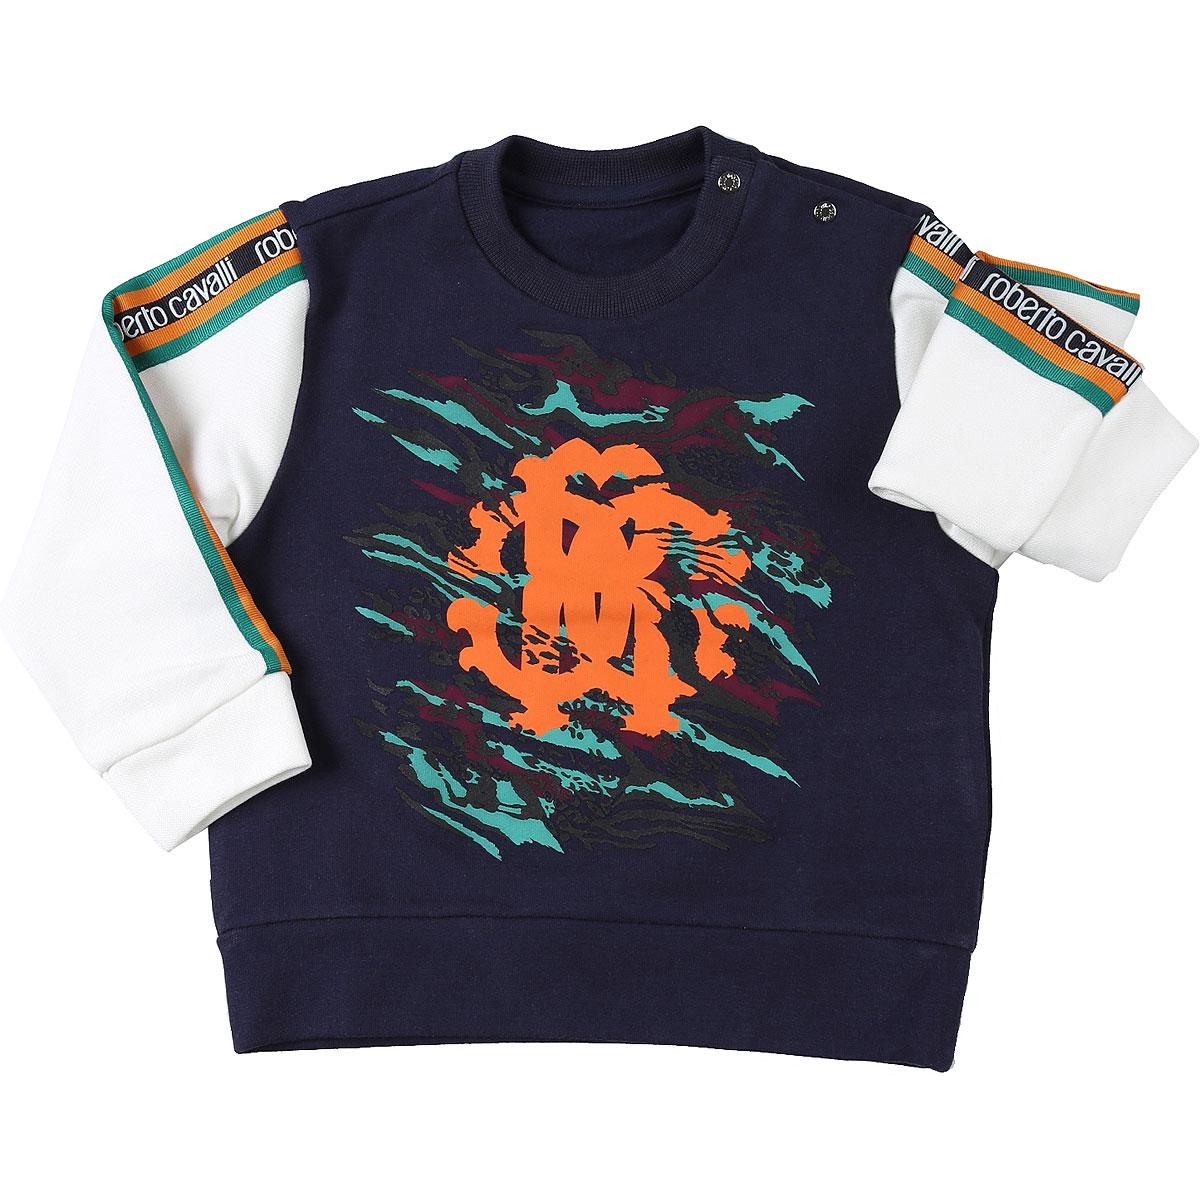 Roberto Cavalli Baby Sweatshirts & Hoodies for Boys On Sale, Blue, Cotton, 2019, 12 M 18M 2Y 3Y